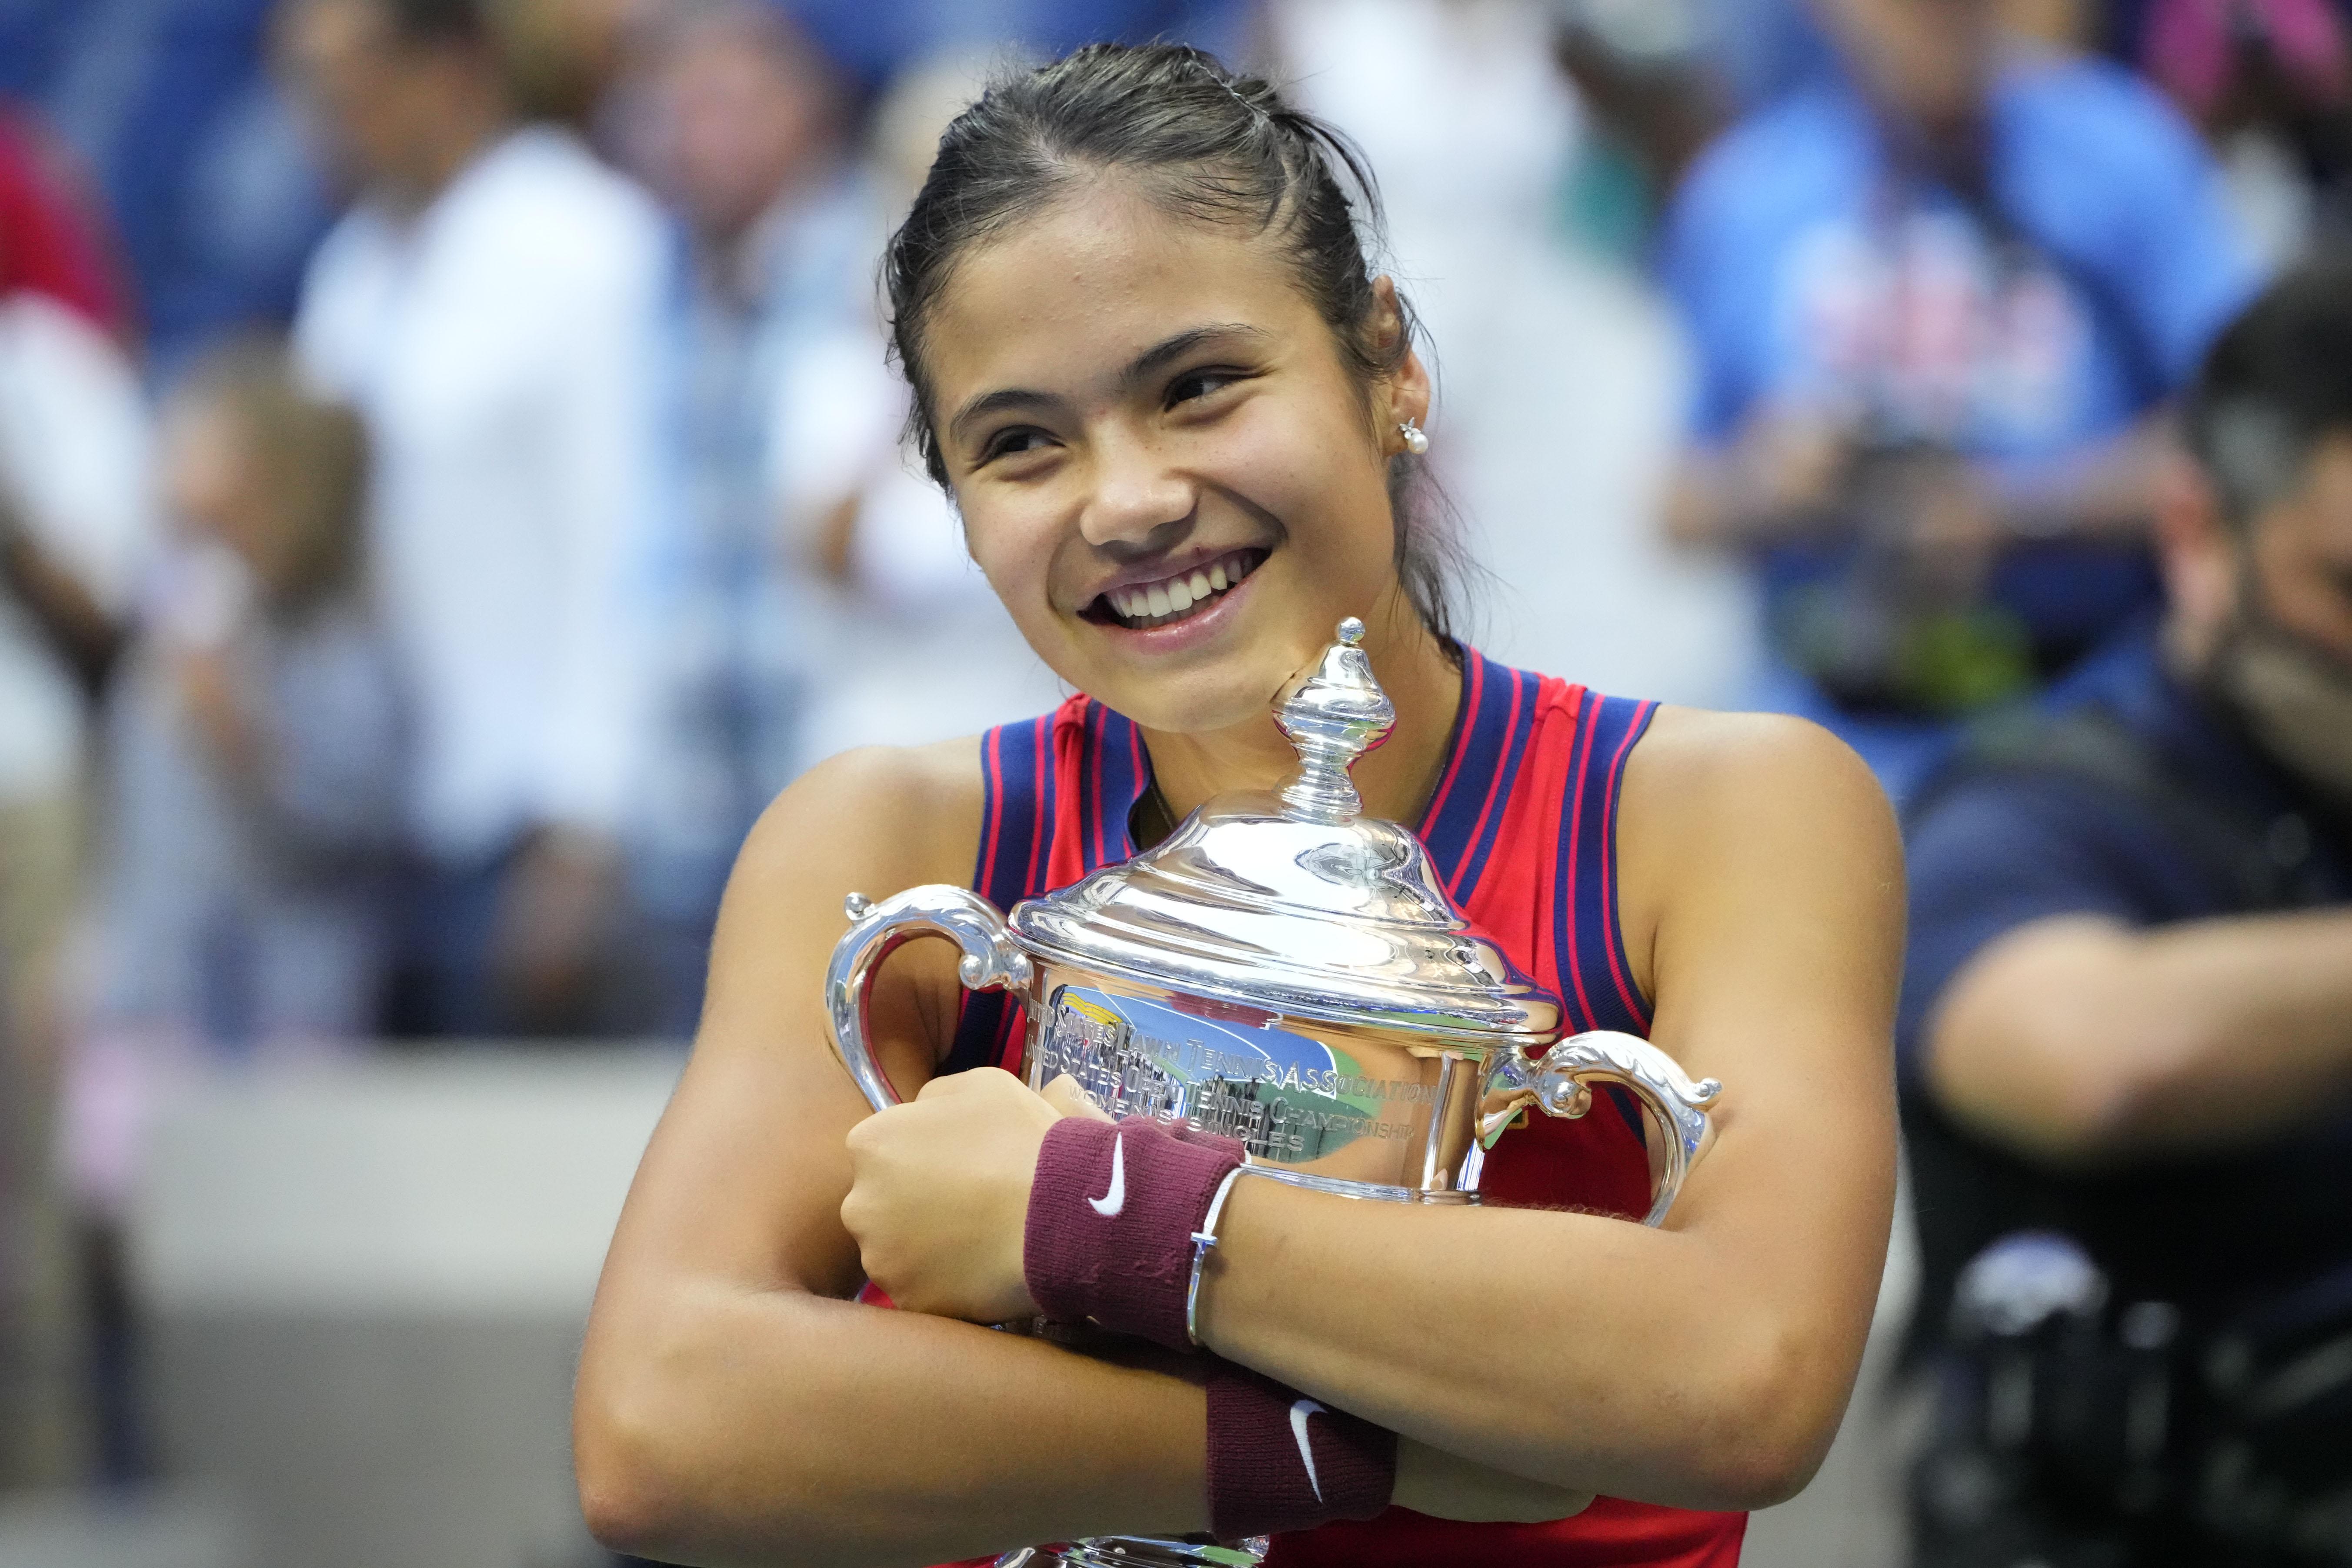 Emma Raducanu and Daniil Medvedev win U.S. Open